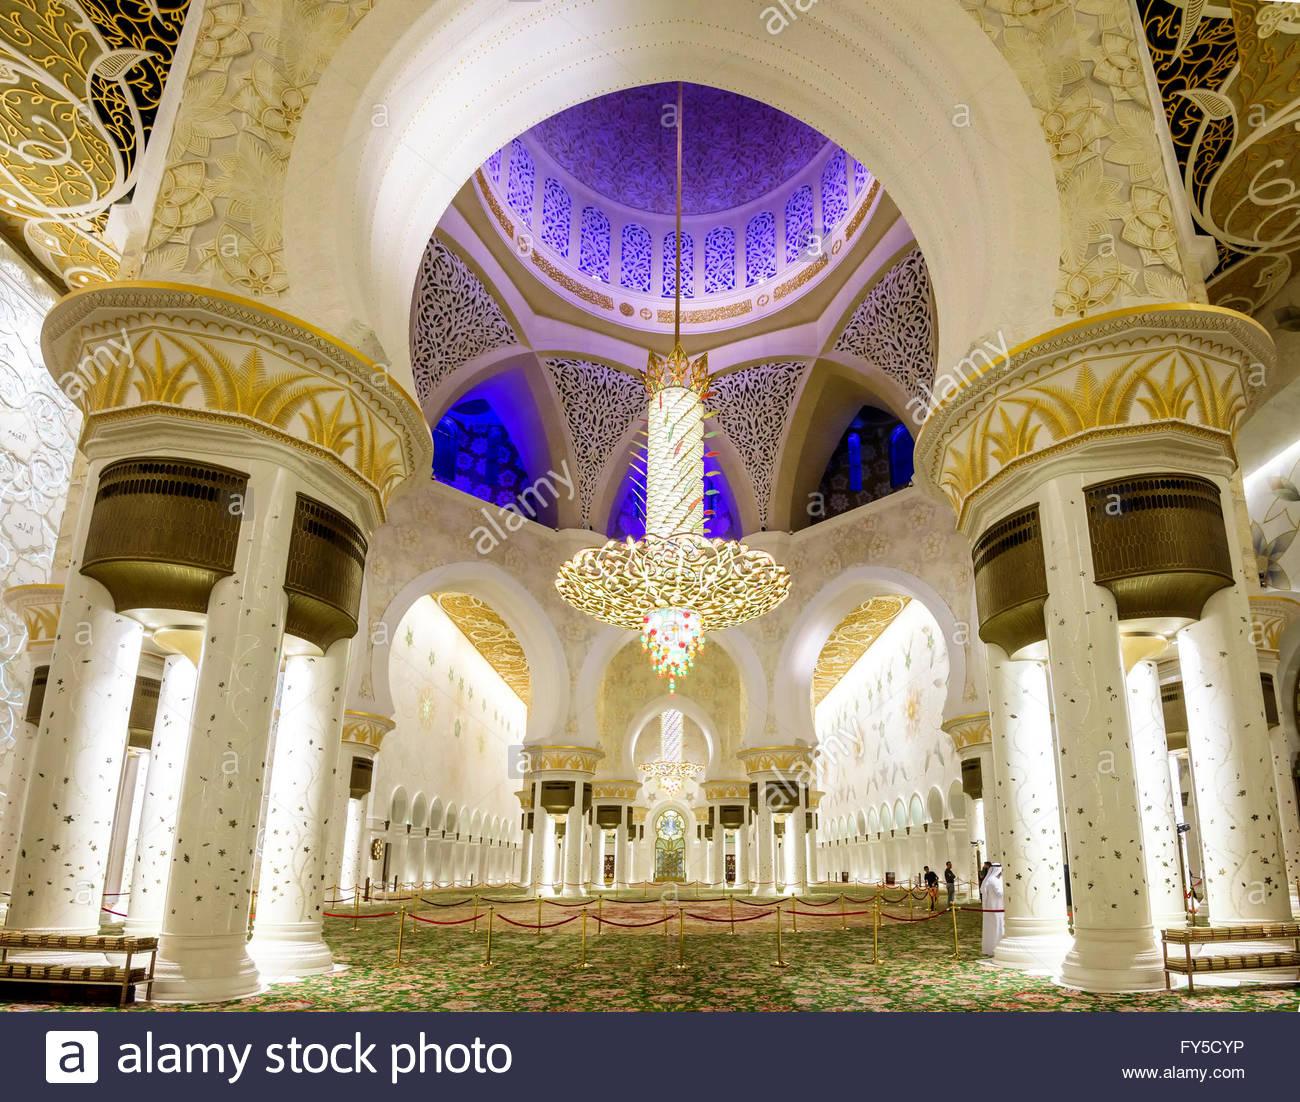 Dentro de la calle Shiekh Zayed Gran Mezquita Imagen De Stock